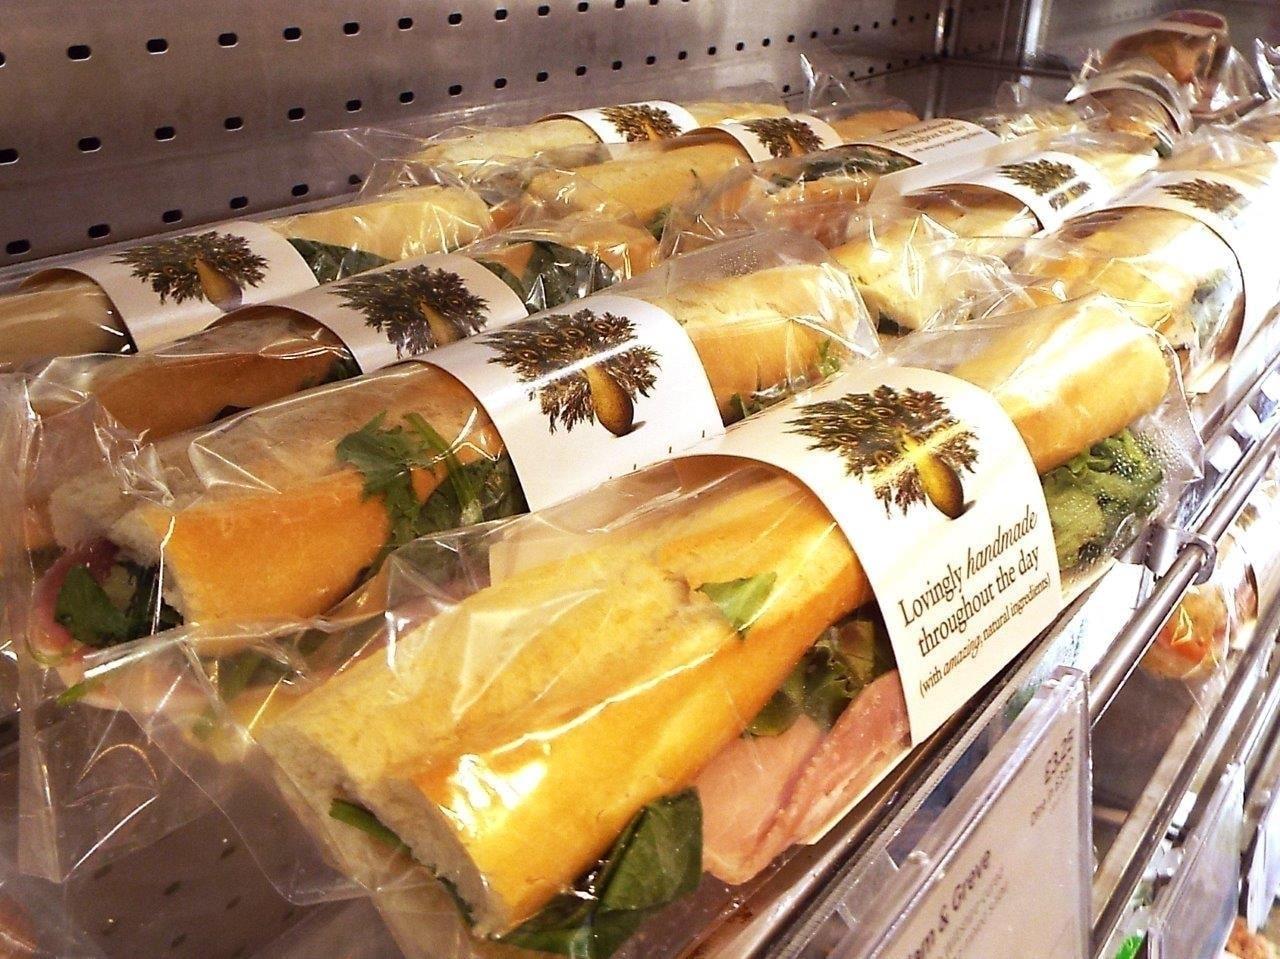 Veggie / vegan Pret baguettes up for grabs!